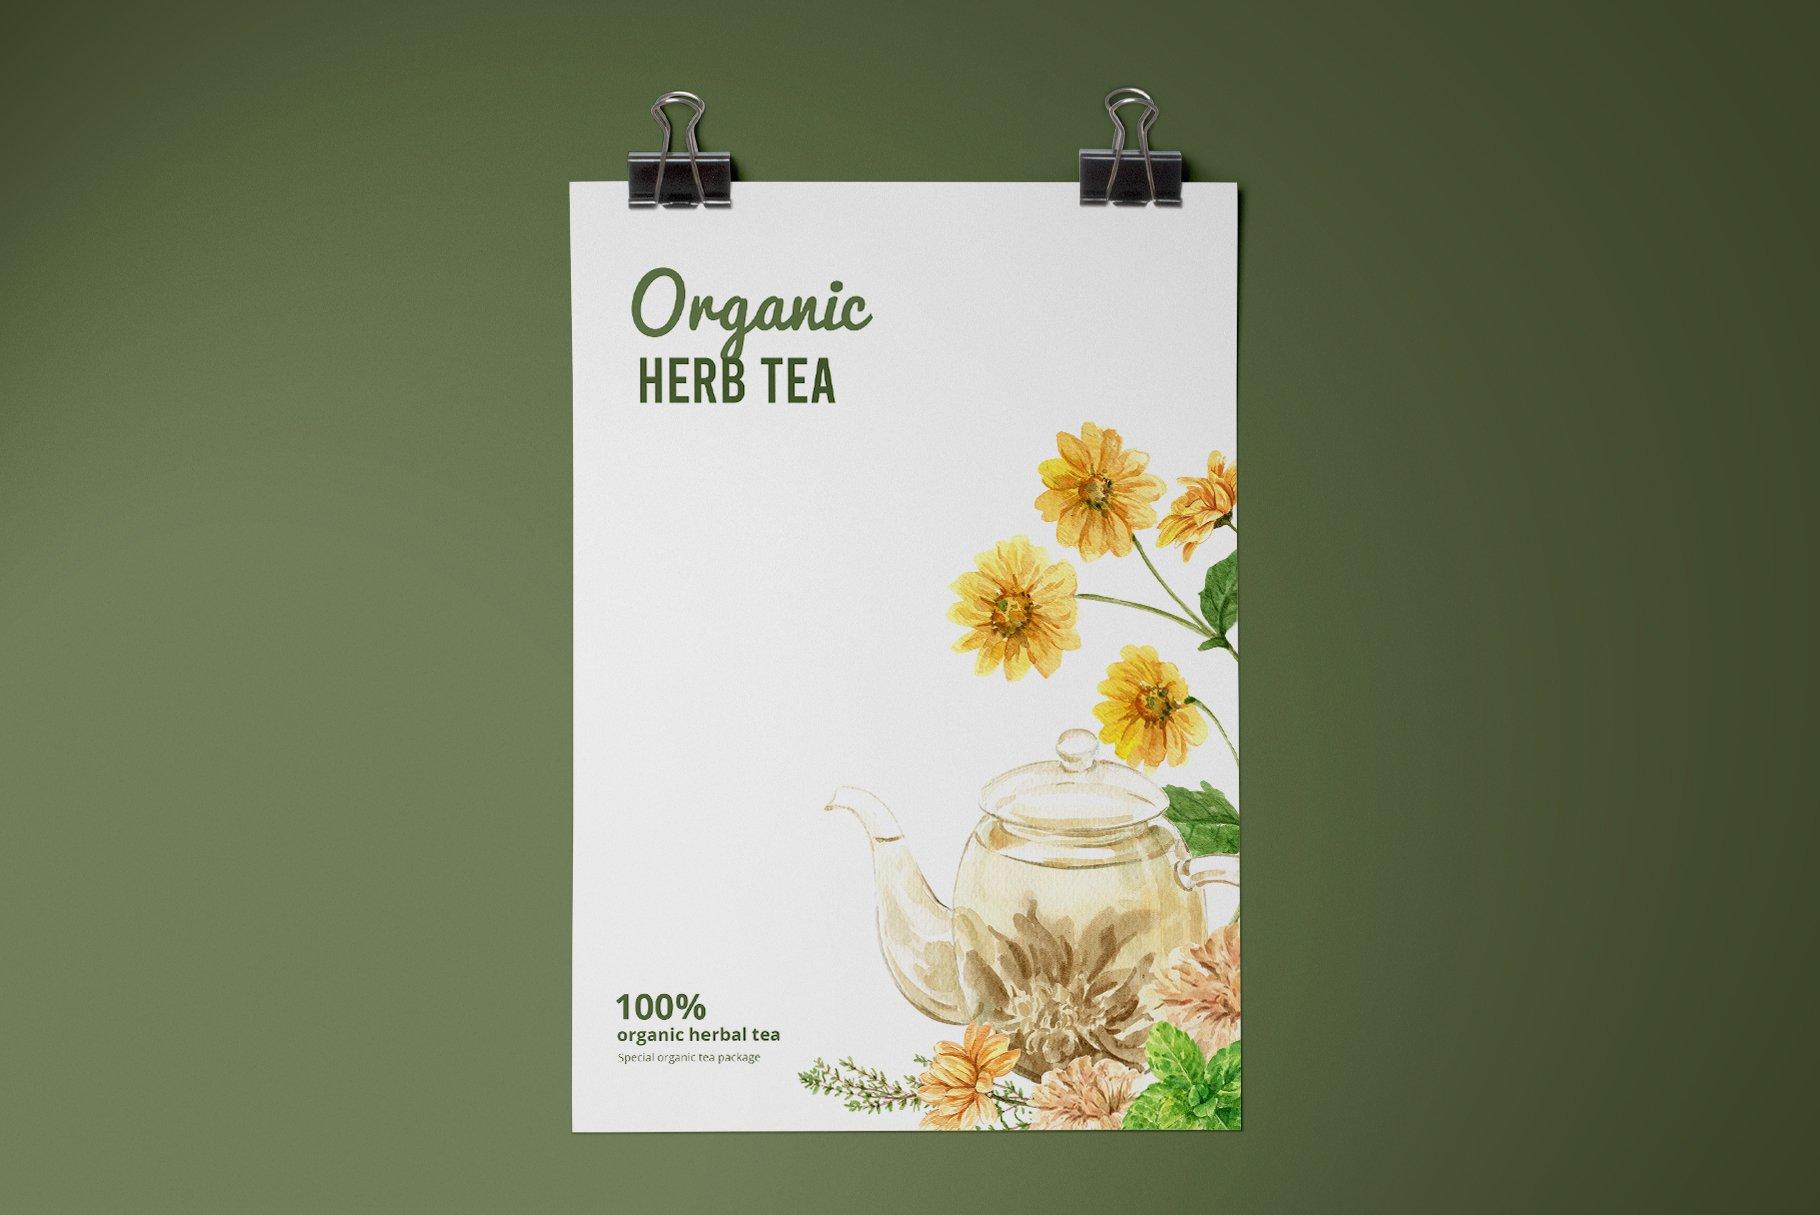 茶叶健康养生元素水彩画PNG免抠图片素材套装 Tea Time With Herbal Tea For Health插图(6)